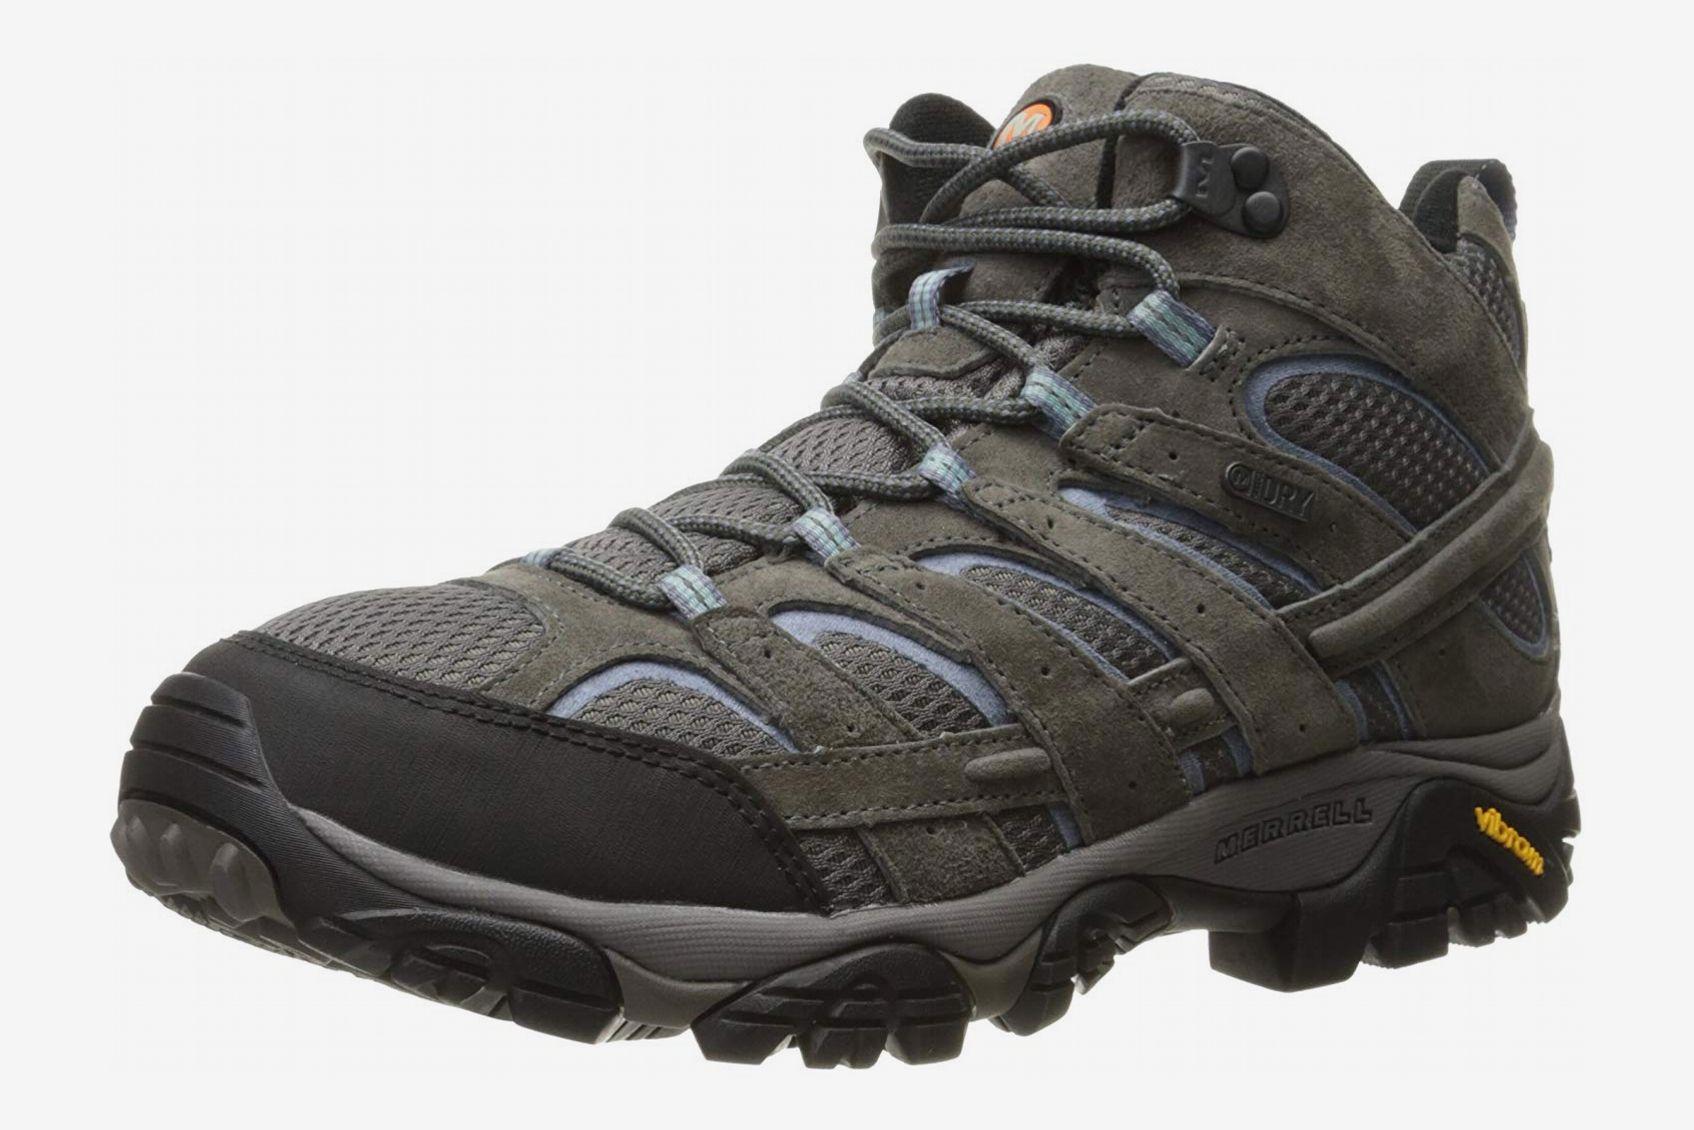 60fe7620524 Merrell Women s Moab 2 Mid Waterproof Hiking Boot at Amazon. Buy